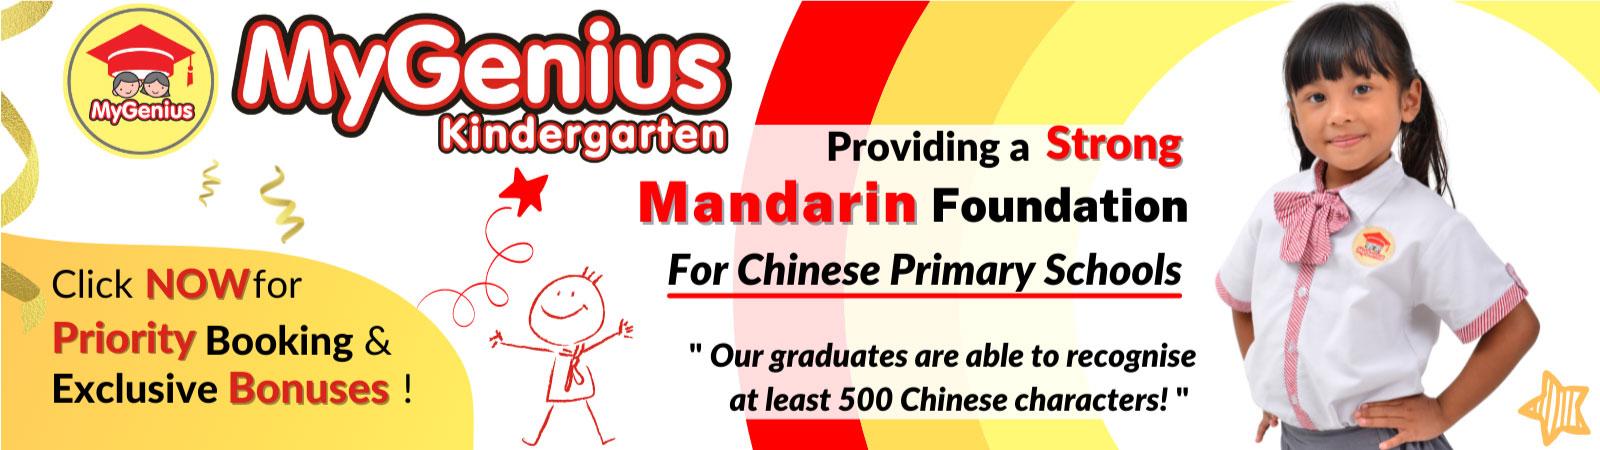 MyGenius Kindergarten @ Cyberjaya: A brilliant start enroute a Chinese Primary School Education